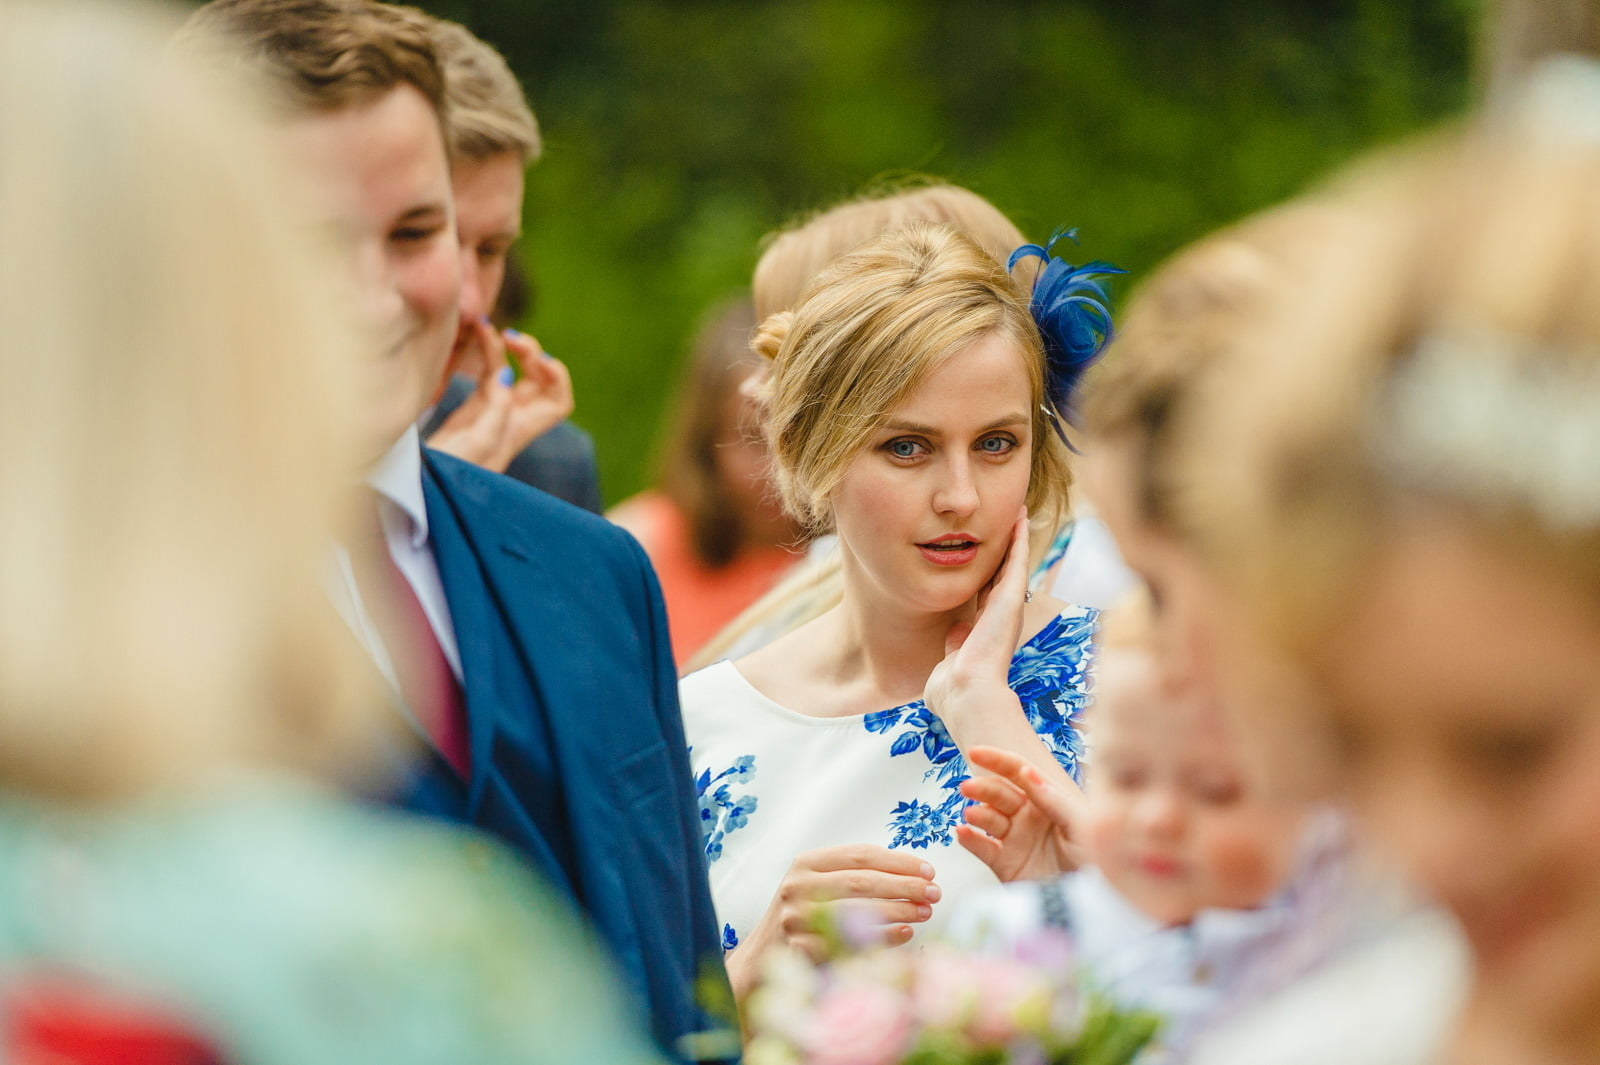 Millers Of Netley wedding, Dorrington, Shrewsbury | Emma + Ben 28